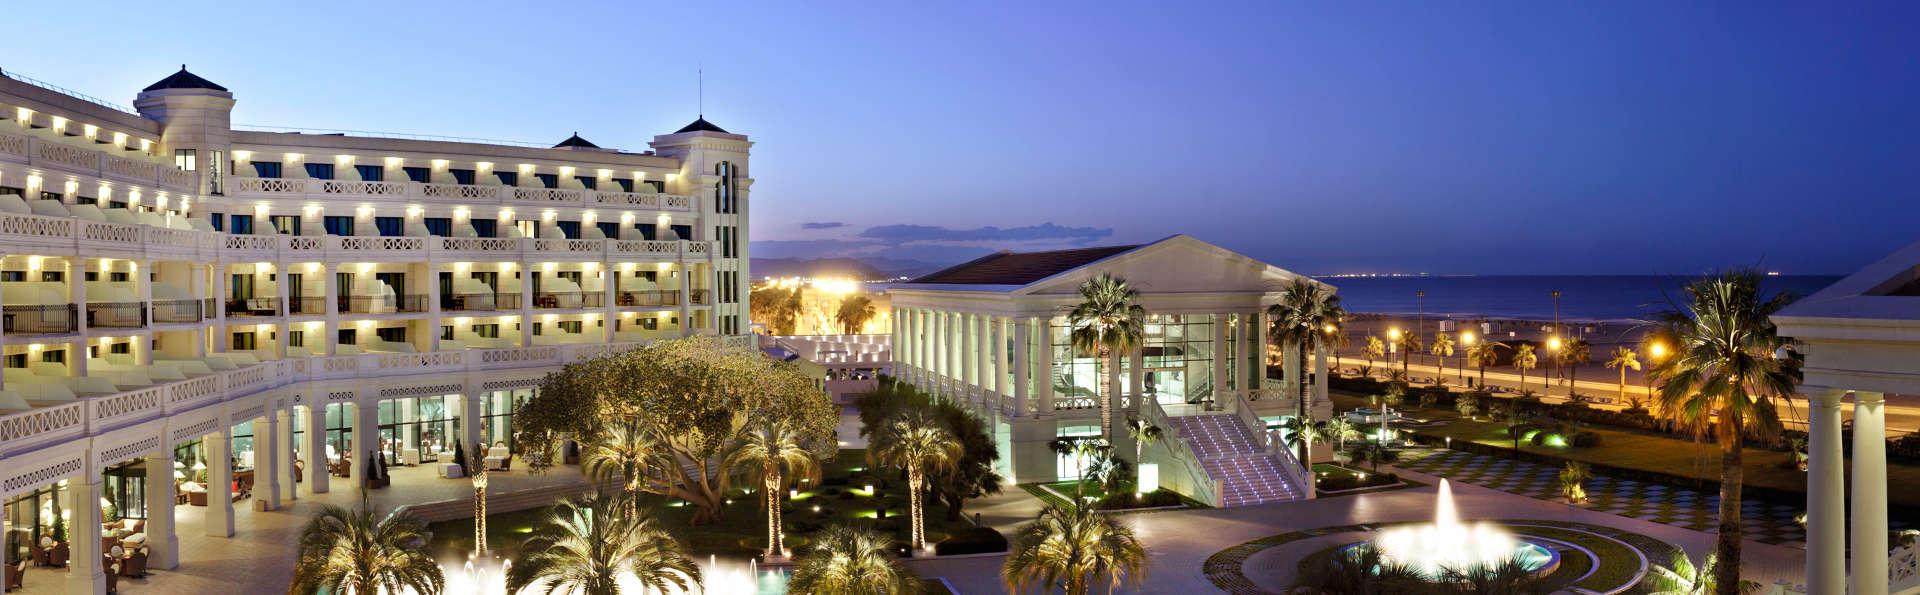 Hotel Las Arenas Balneario Resort - edit_front9.jpg